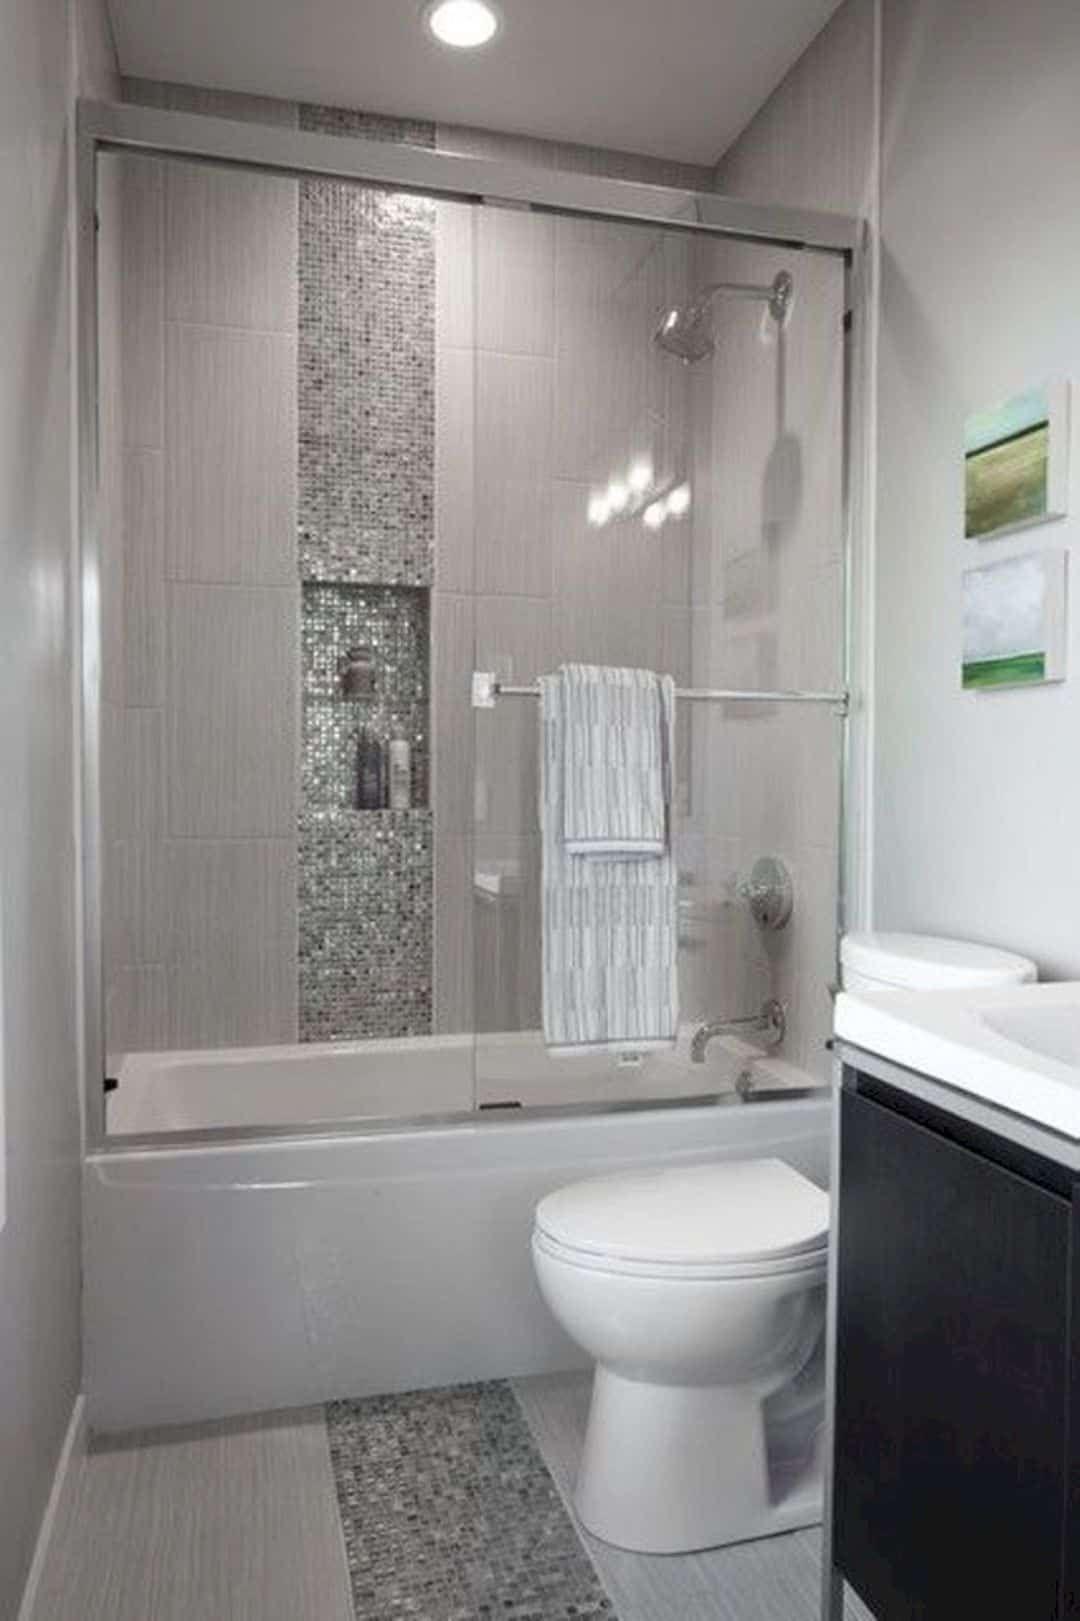 17 Small Townhouse Interior Design Ideas Bathroom Remodel Cost Small Bathroom Makeover Small Bathroom Remodel